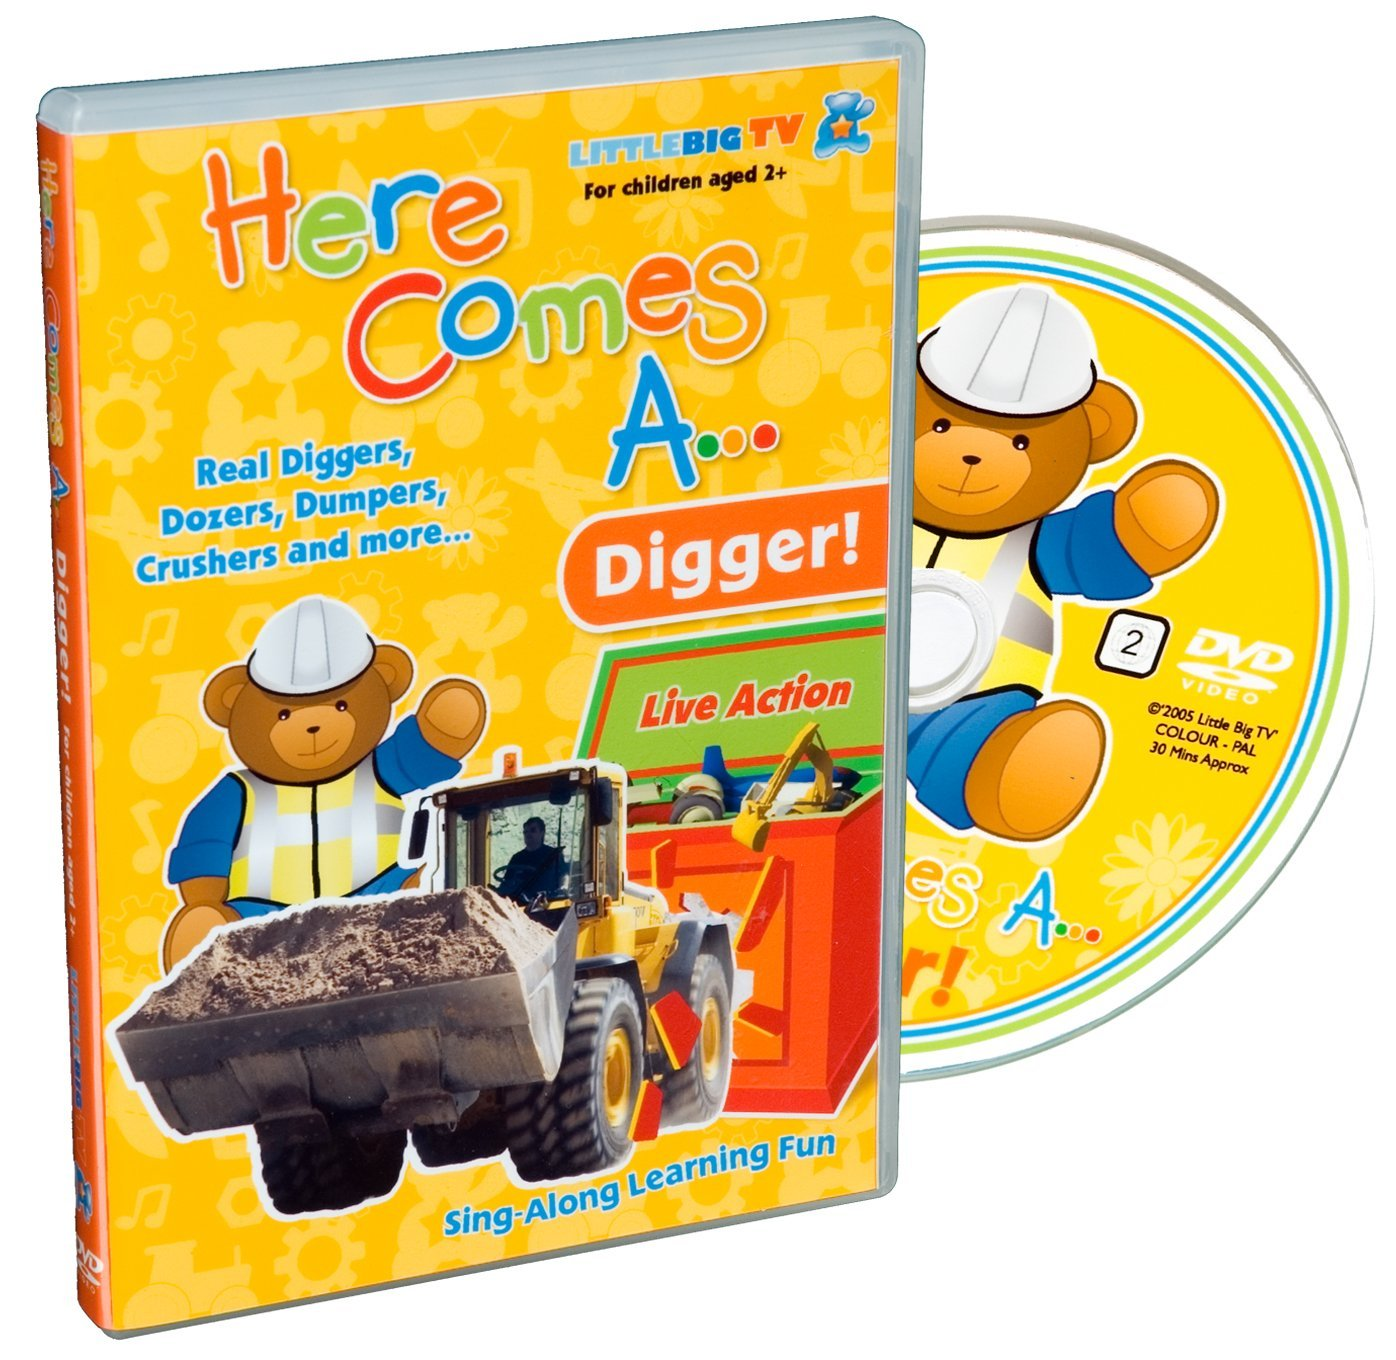 here comes a digger dvd 2004 amazon co uk francesca caleb